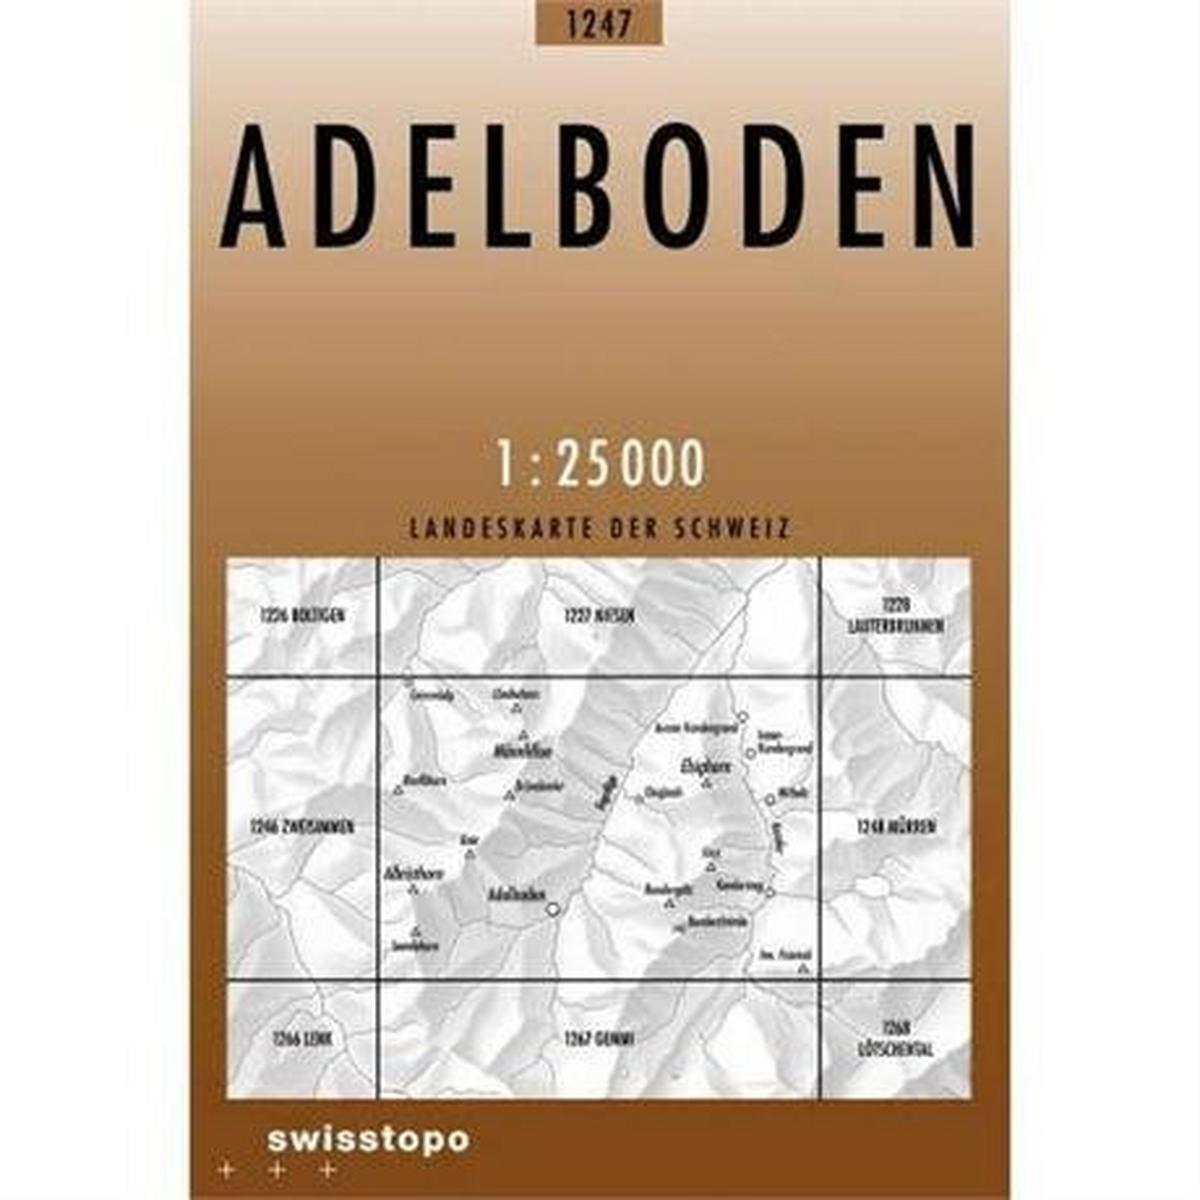 Miscellaneous Switzerland Map 1247 Adelboden 1:25,000